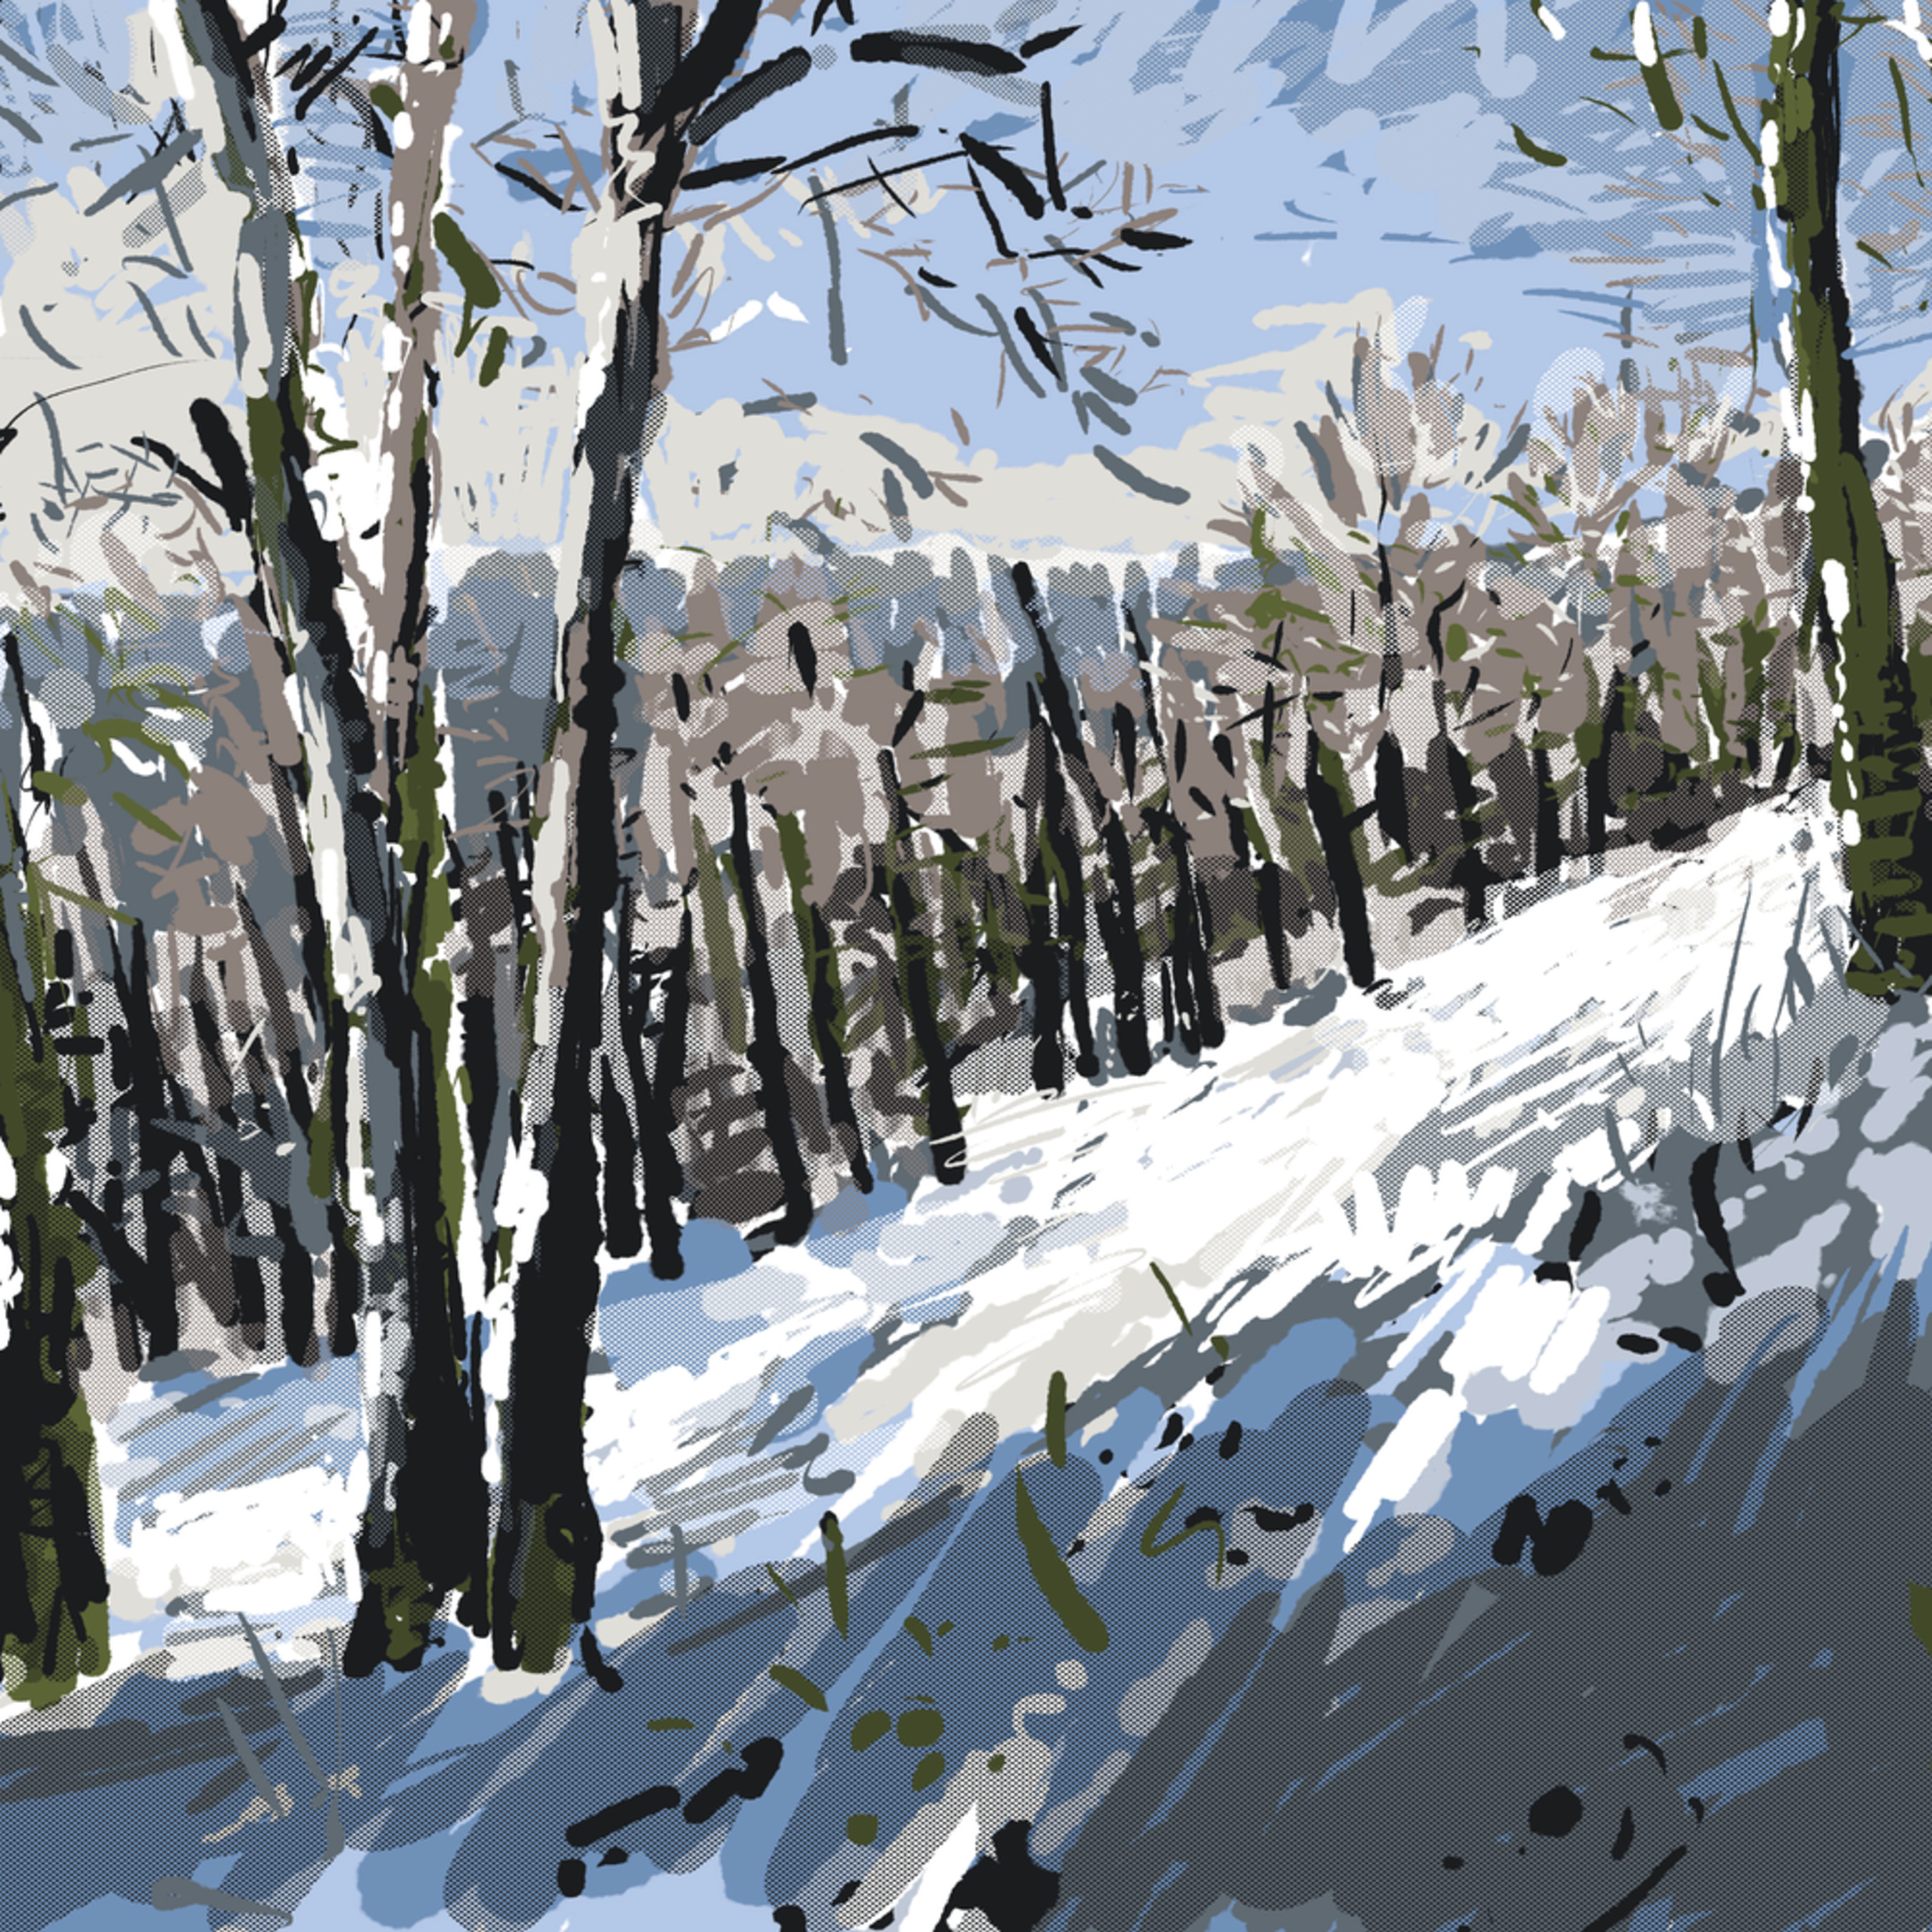 Pine ridge prairie in snow by andrew daniel fh8mqu